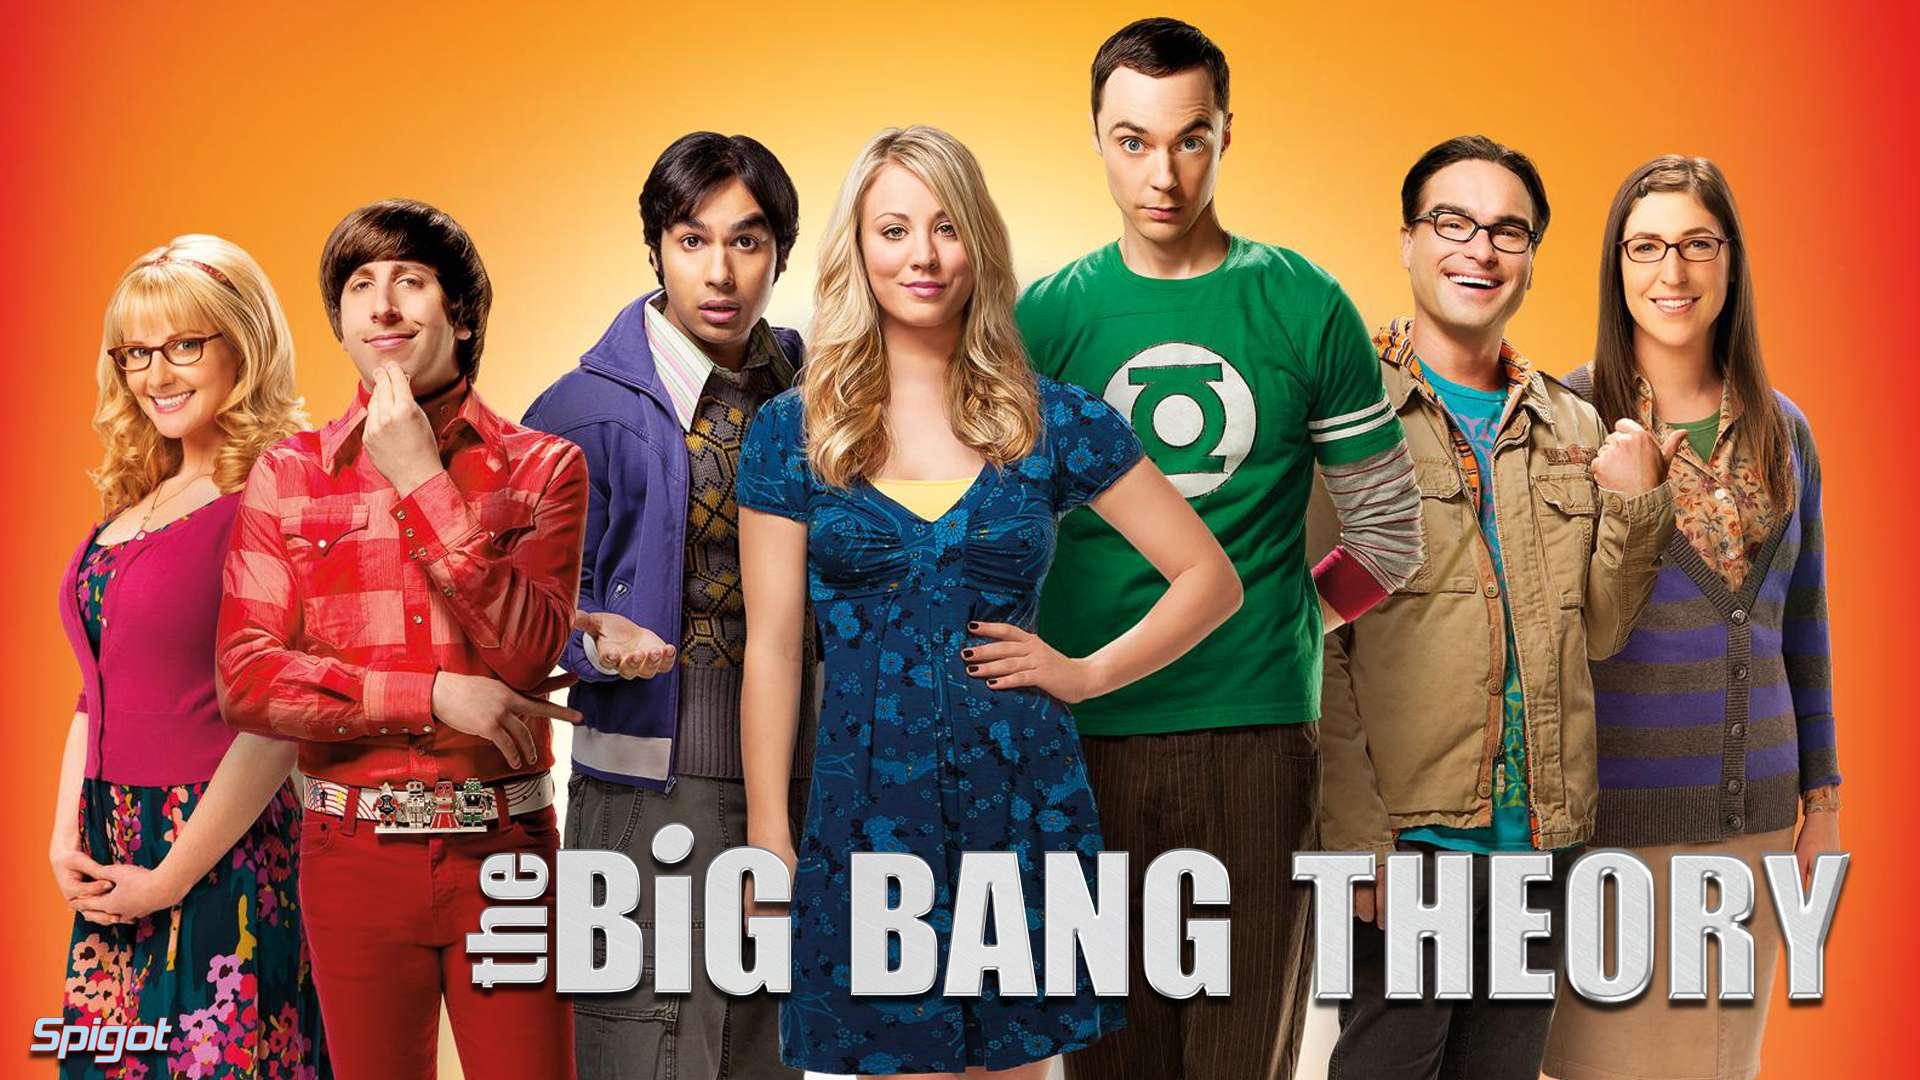 The Big Bang Theory S09E22 vostfr